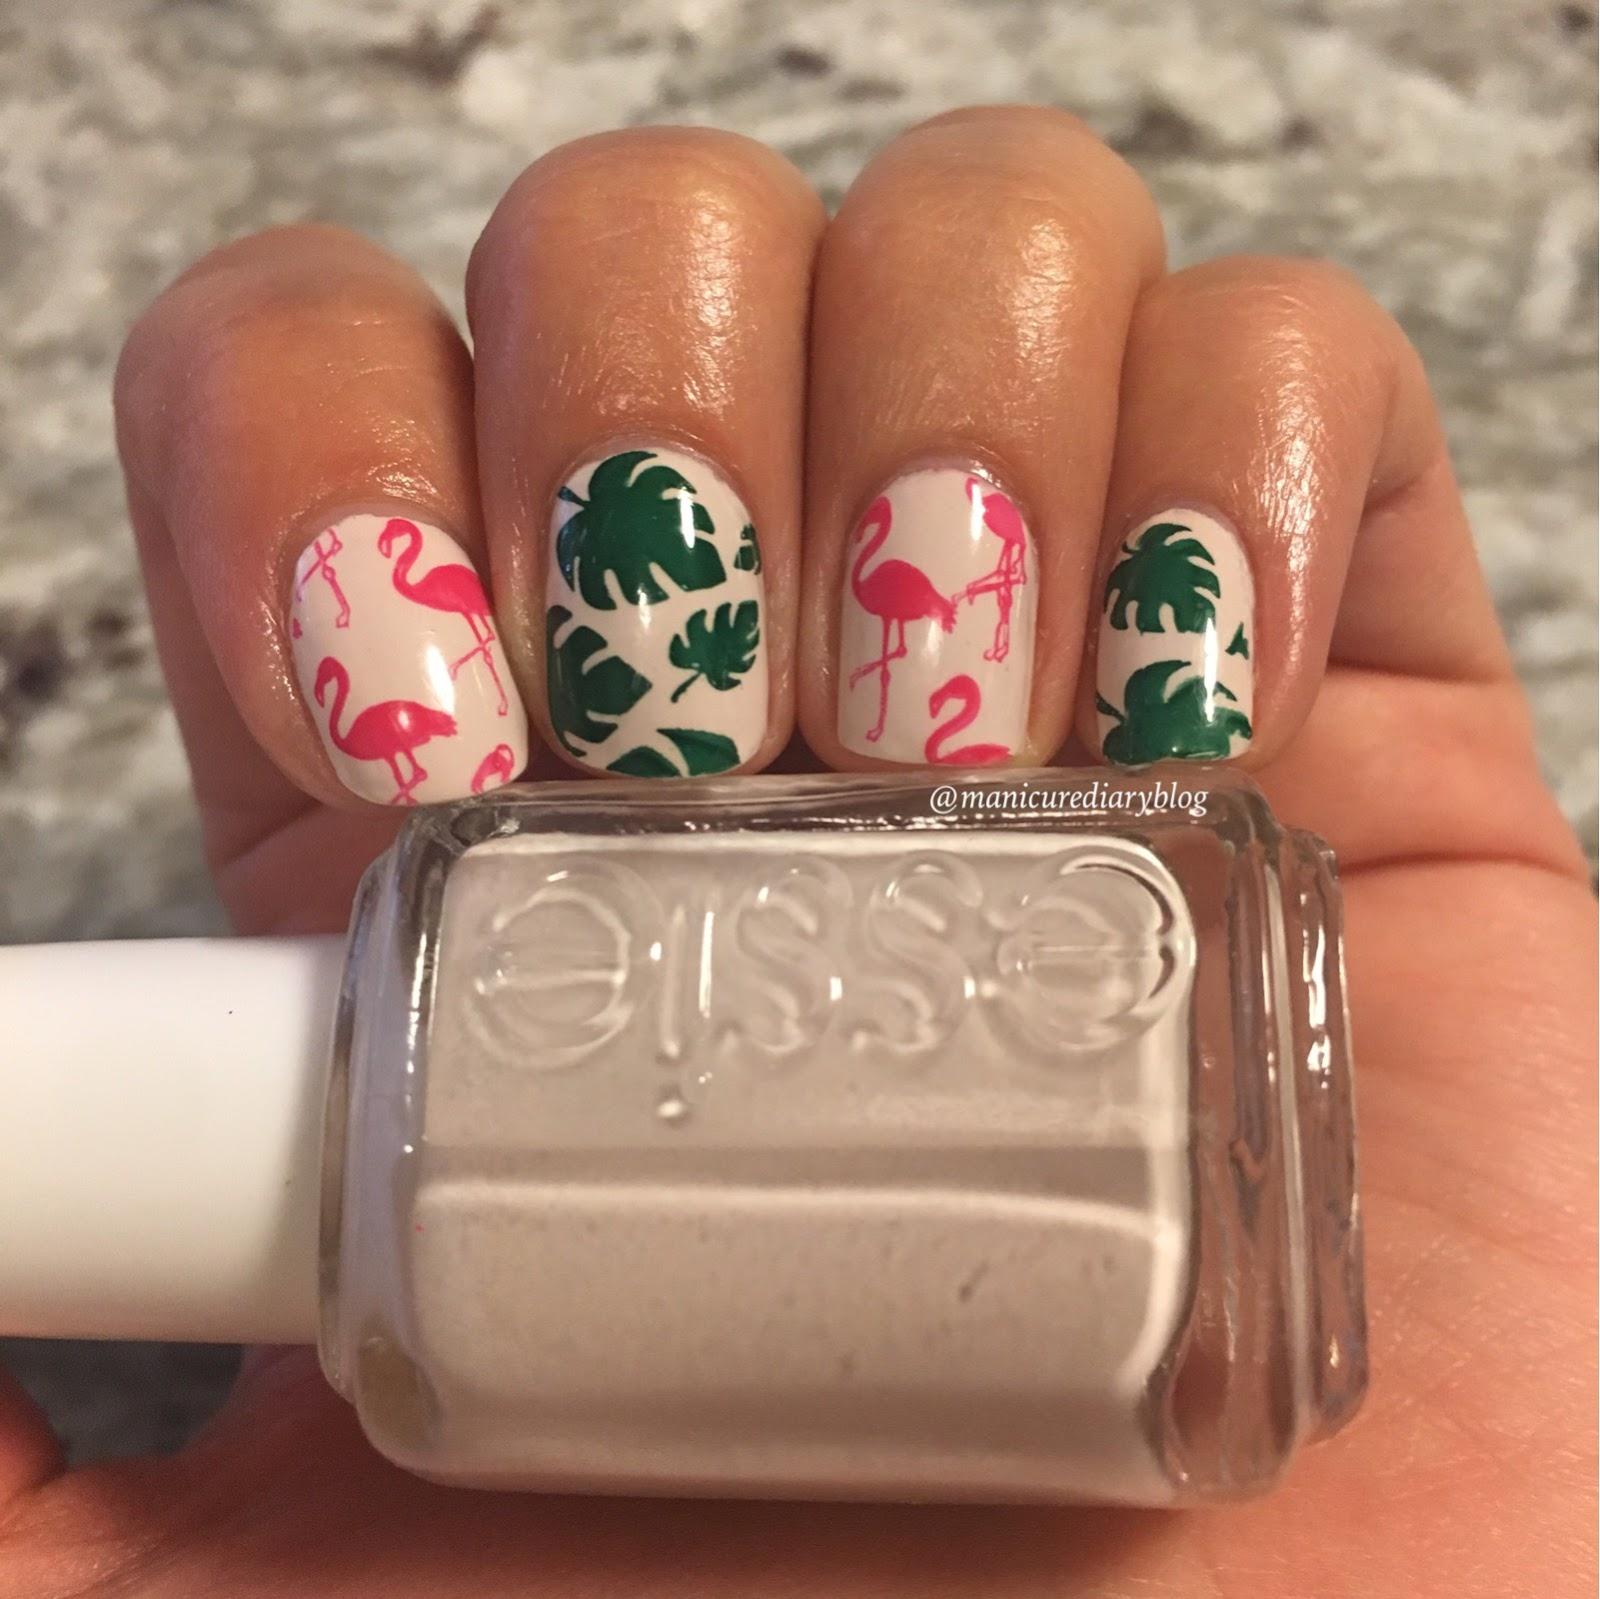 Essie Nail Color Urban Jungle: I'm So Polished: Essie Urban Jungle